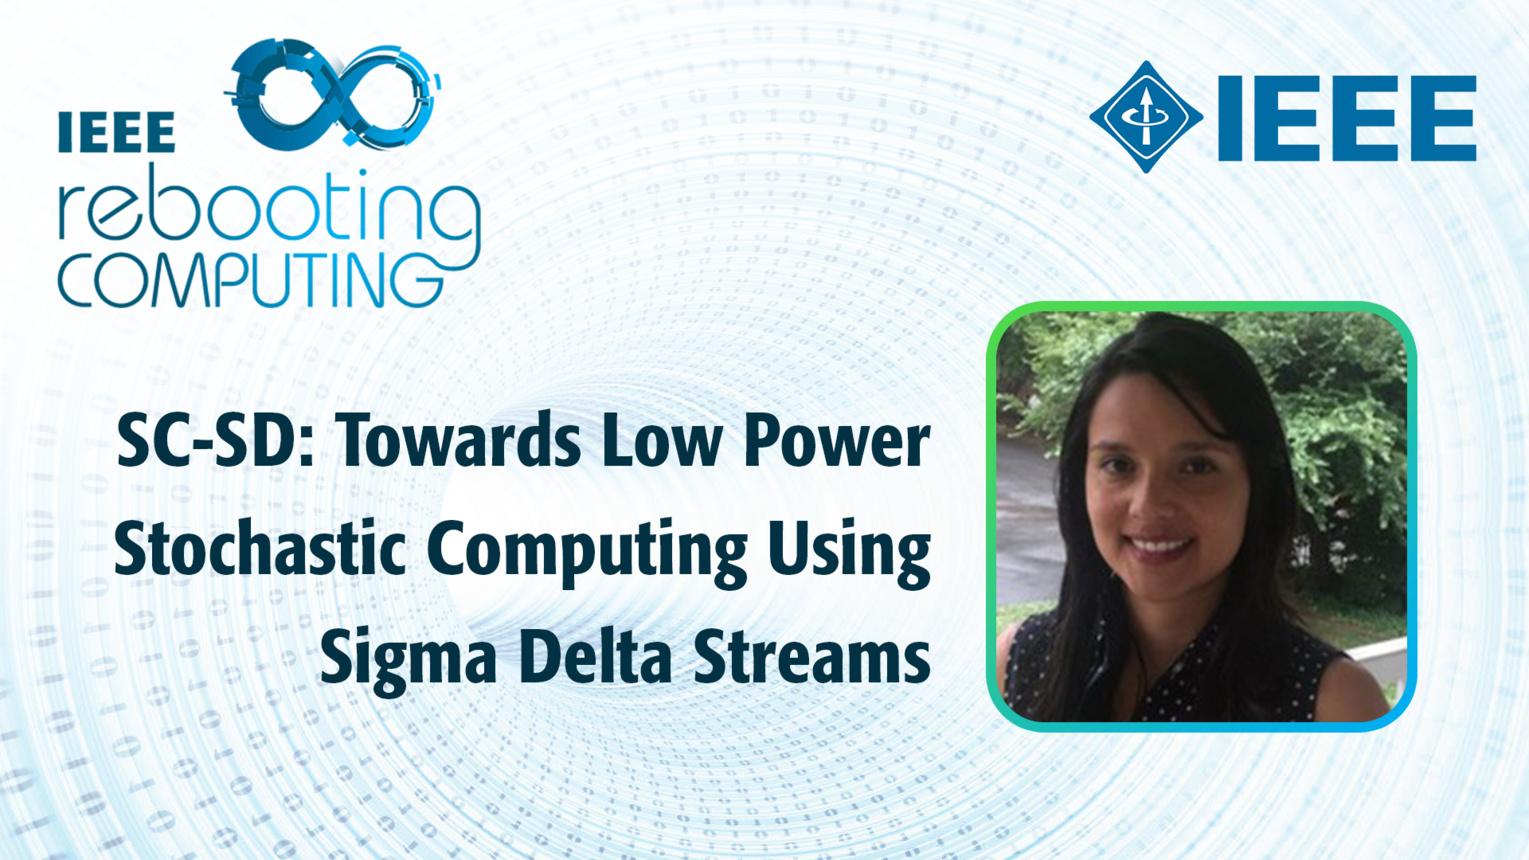 SC-SD: Towards Low Power Stochastic Computing using Sigma Delta Streams - Patricia Gonzalez-Guerrero - ICRC 2018